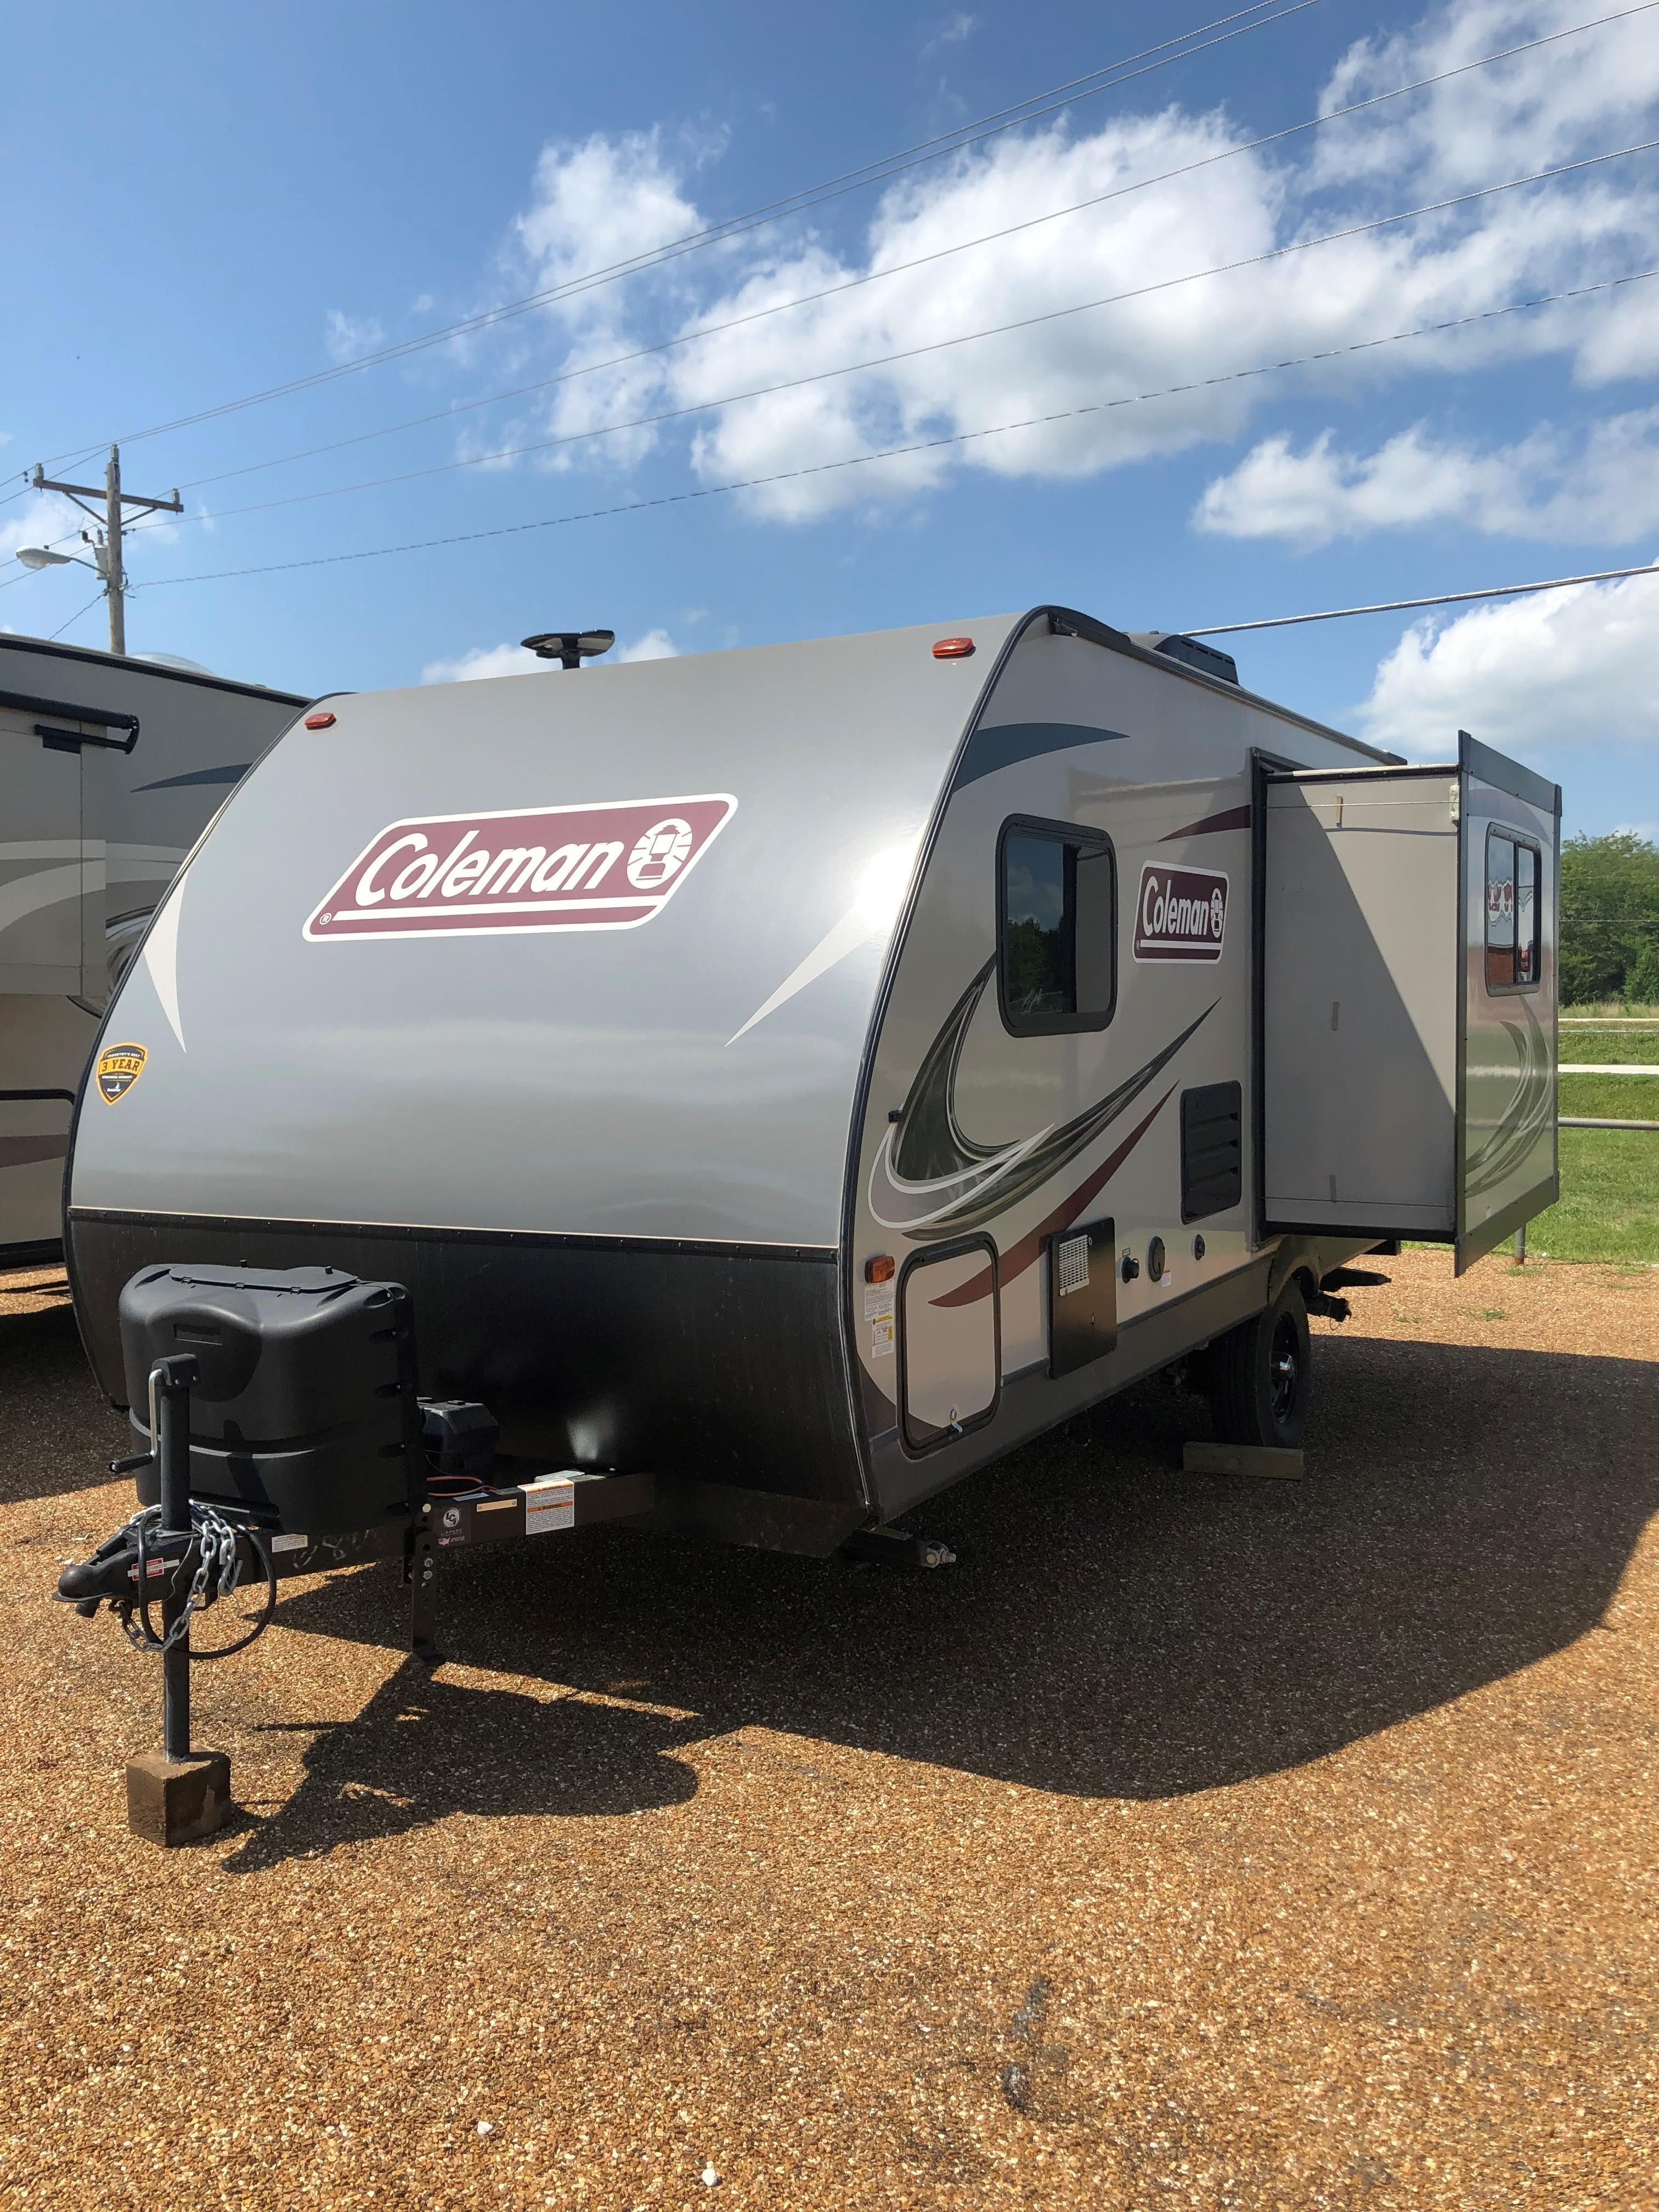 Missouri - Reeper For Sale - Oreion RVs - RV Trader